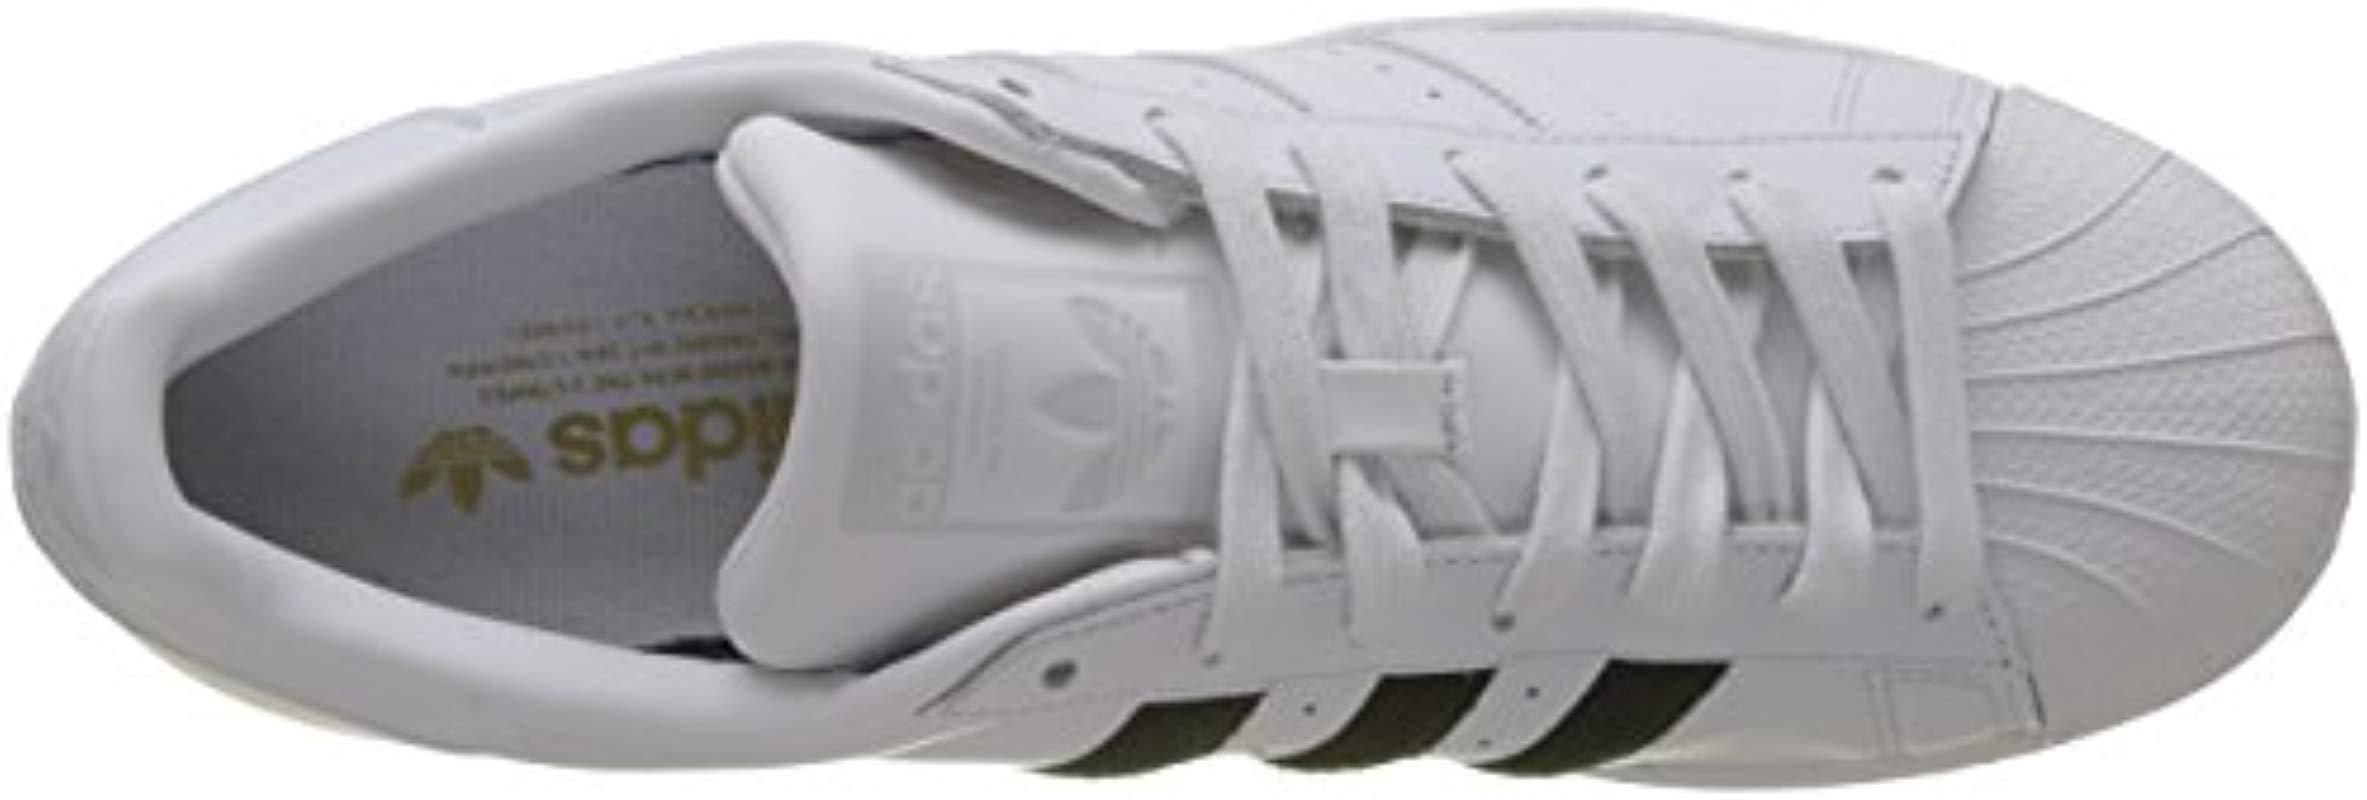 973323ee2f4f adidas Superstar Cm8073 Low-top Sneakers, (crystal White/collegiate ...